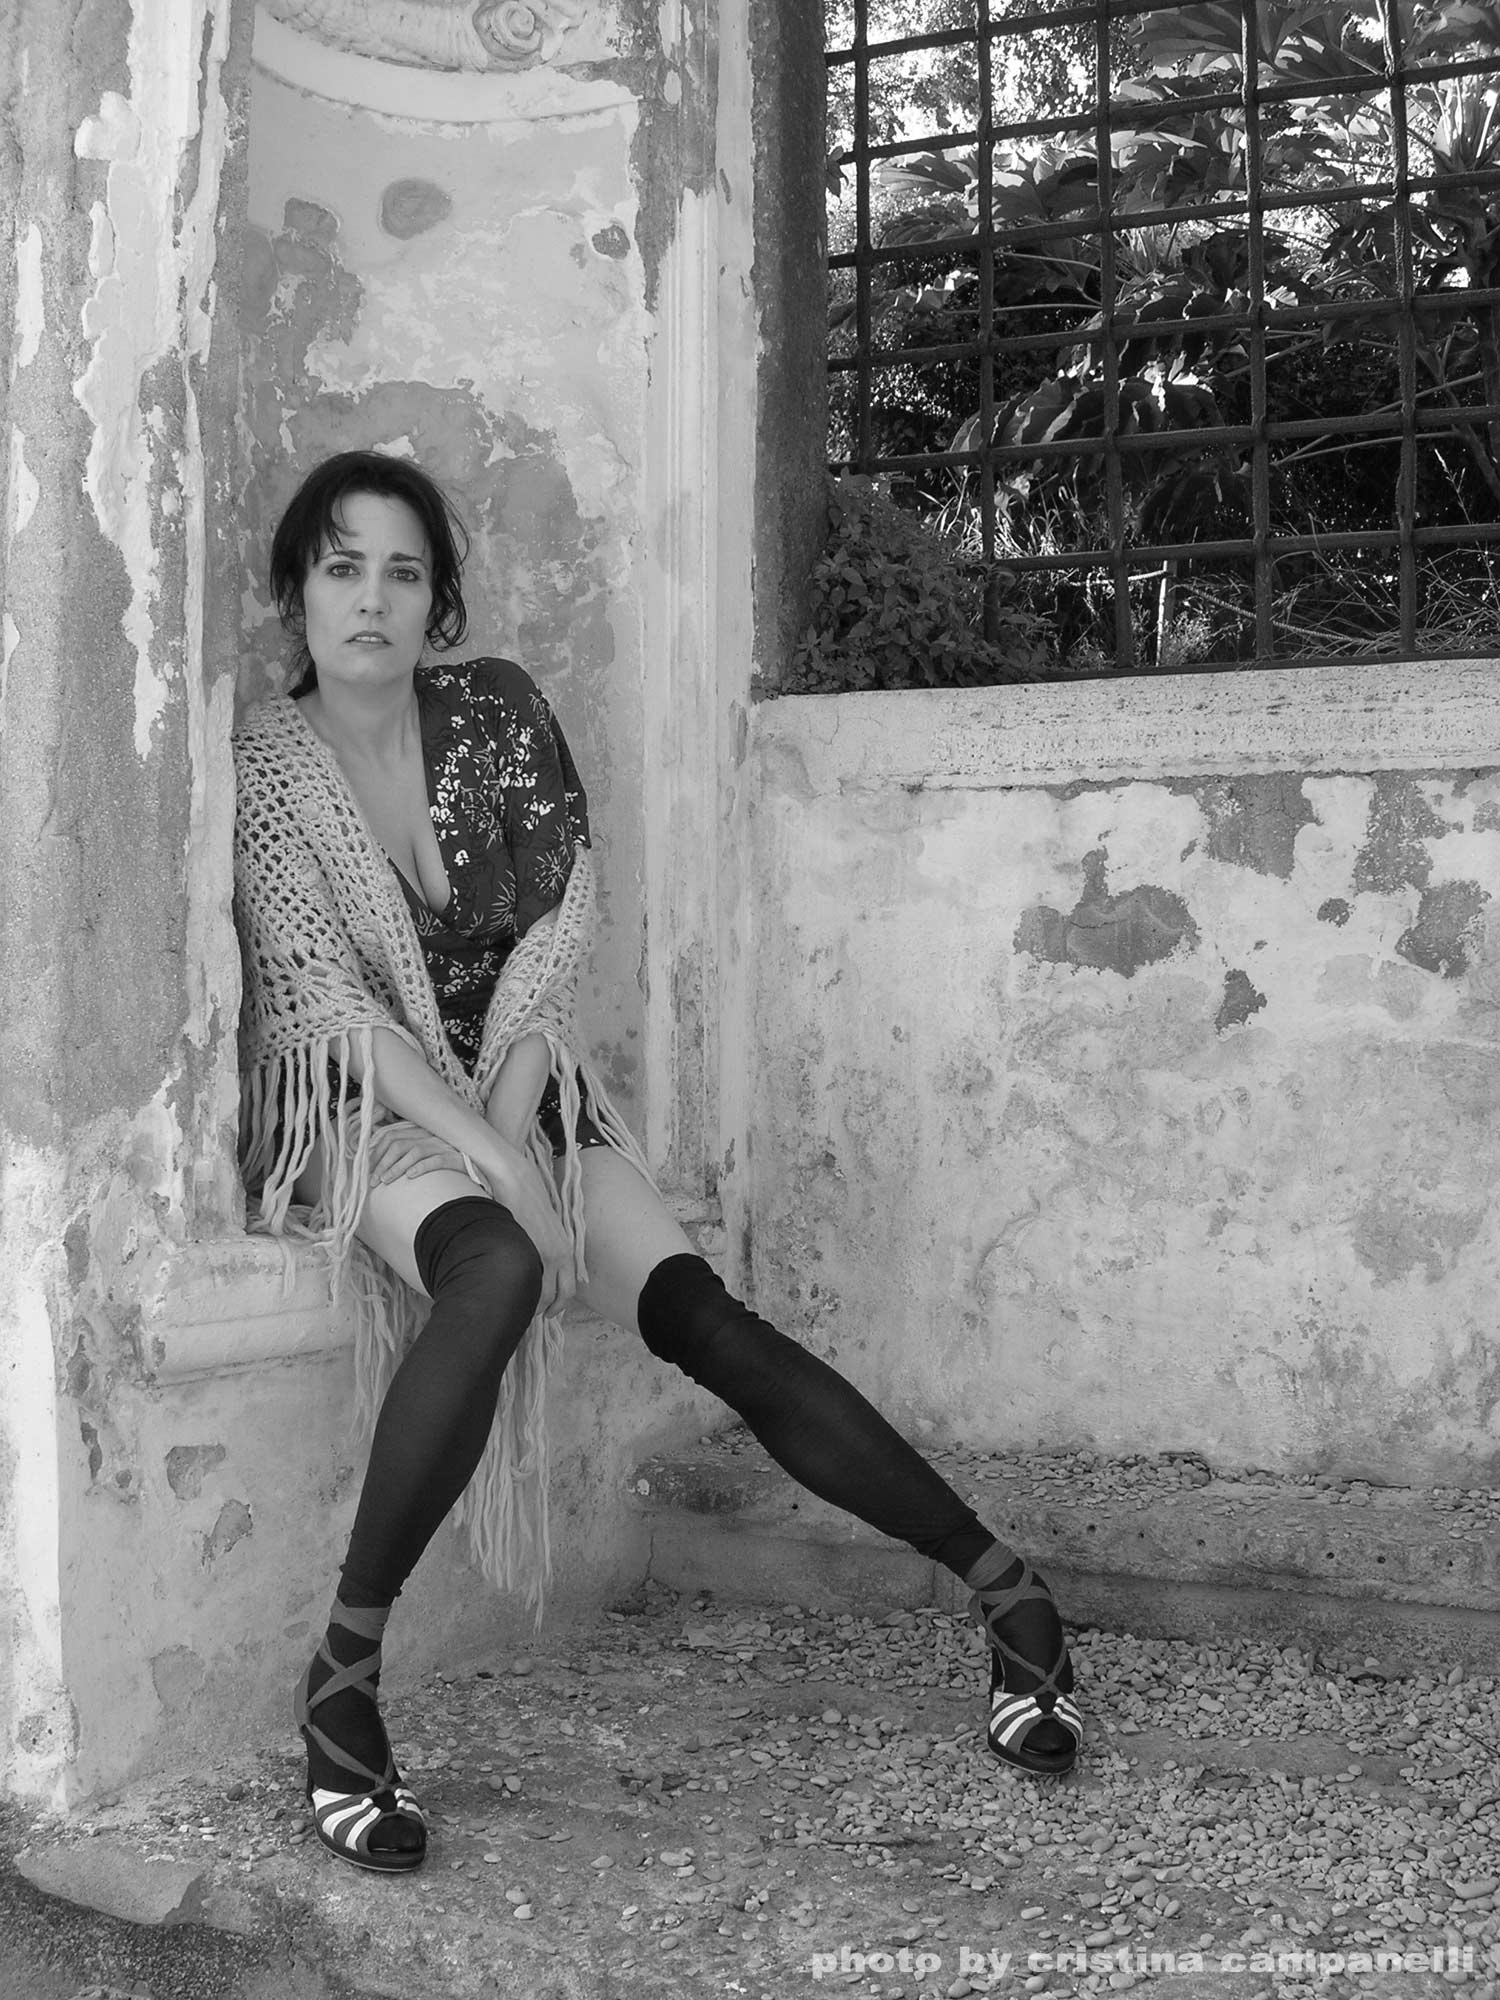 Coralina Cataldi-Tassoni photo by Cristina Campanelli (7).jpg